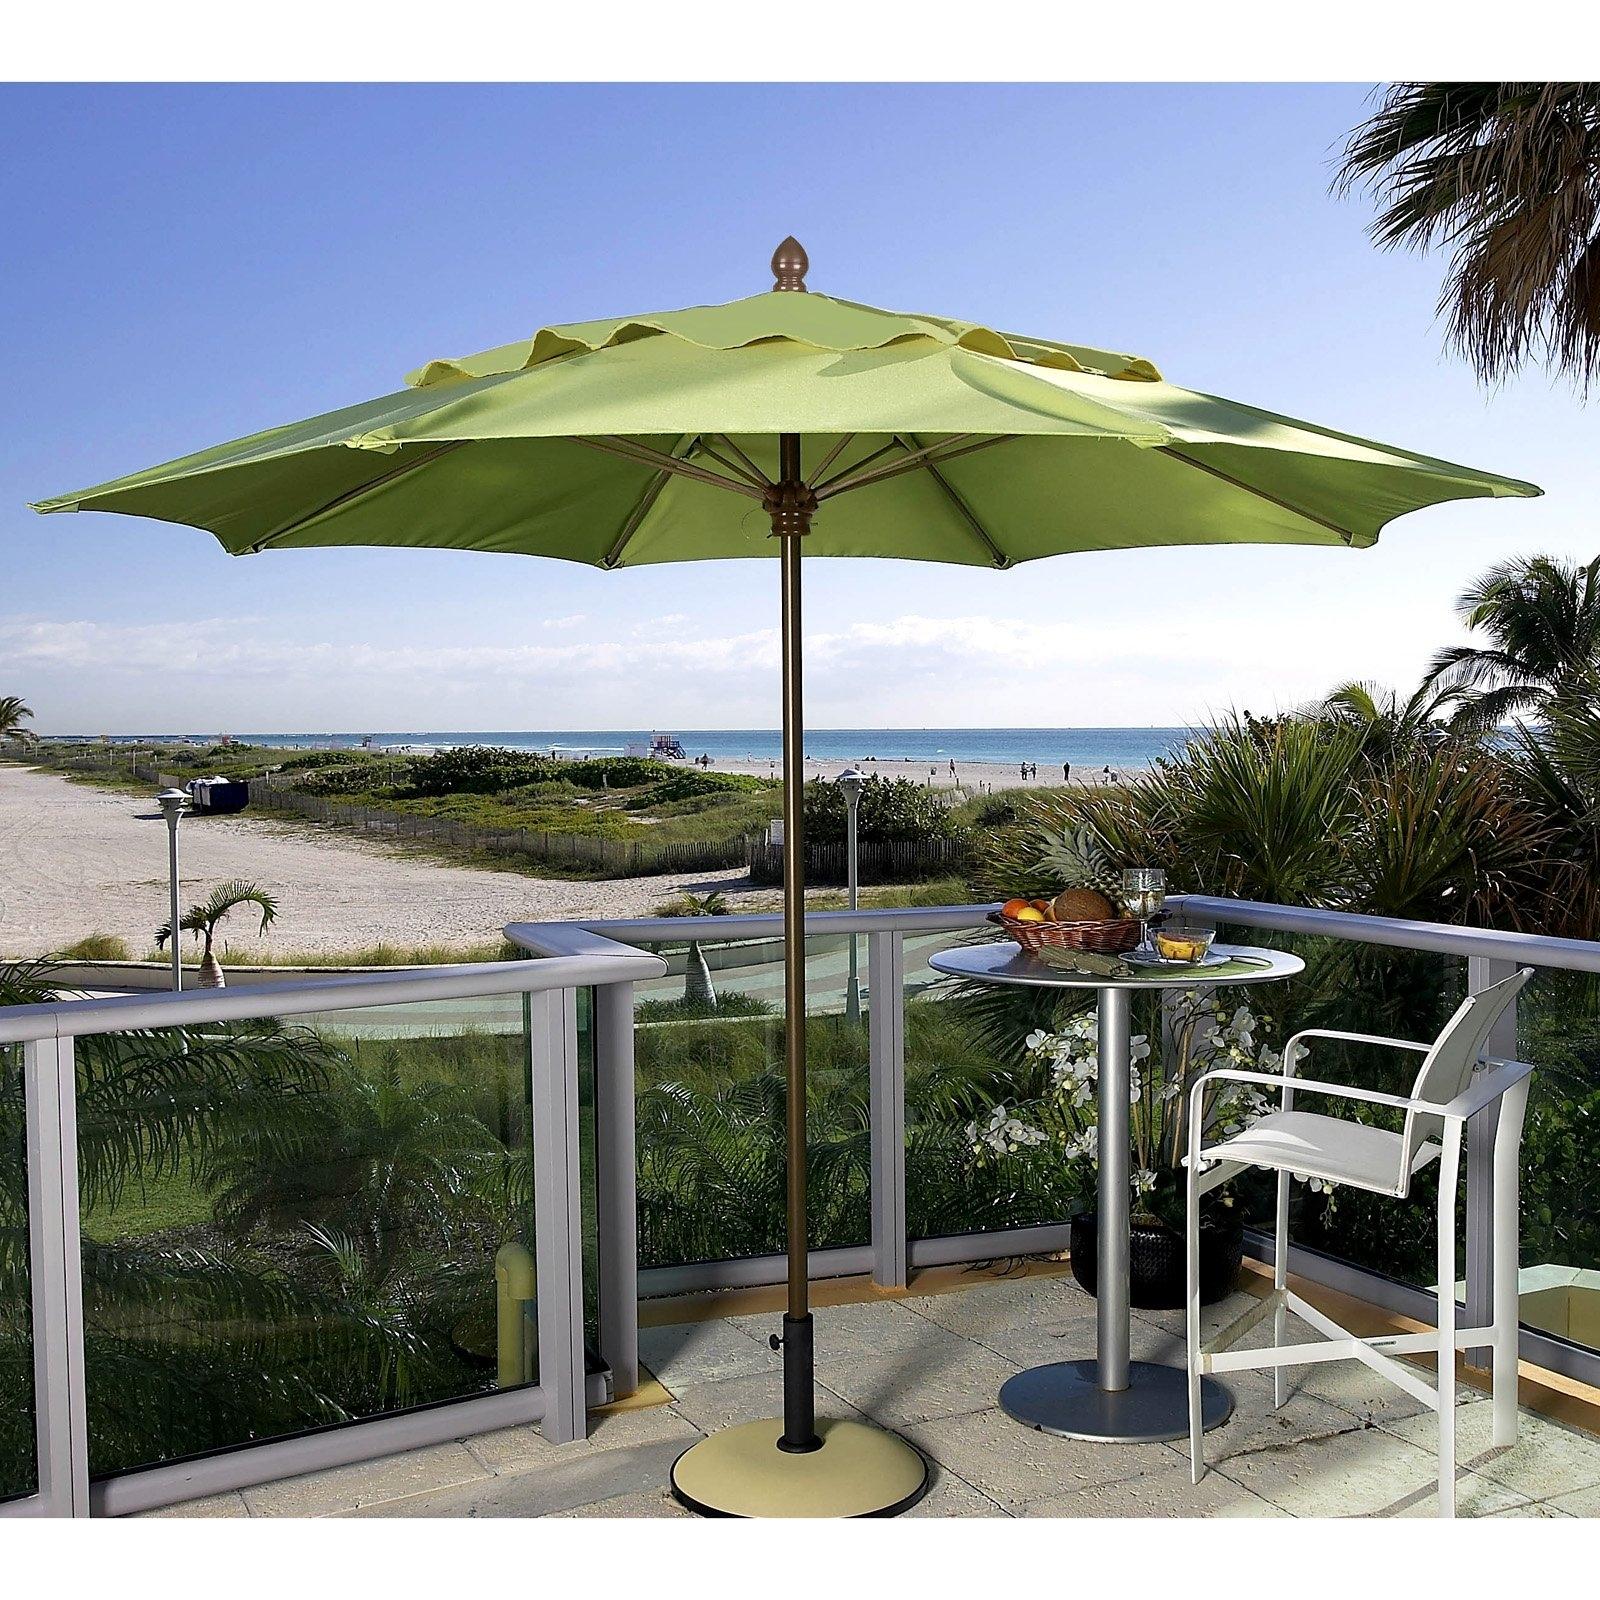 Preferred Oversized Patio Umbrellas Regarding Small Patio Umbrellas Sale (View 16 of 20)